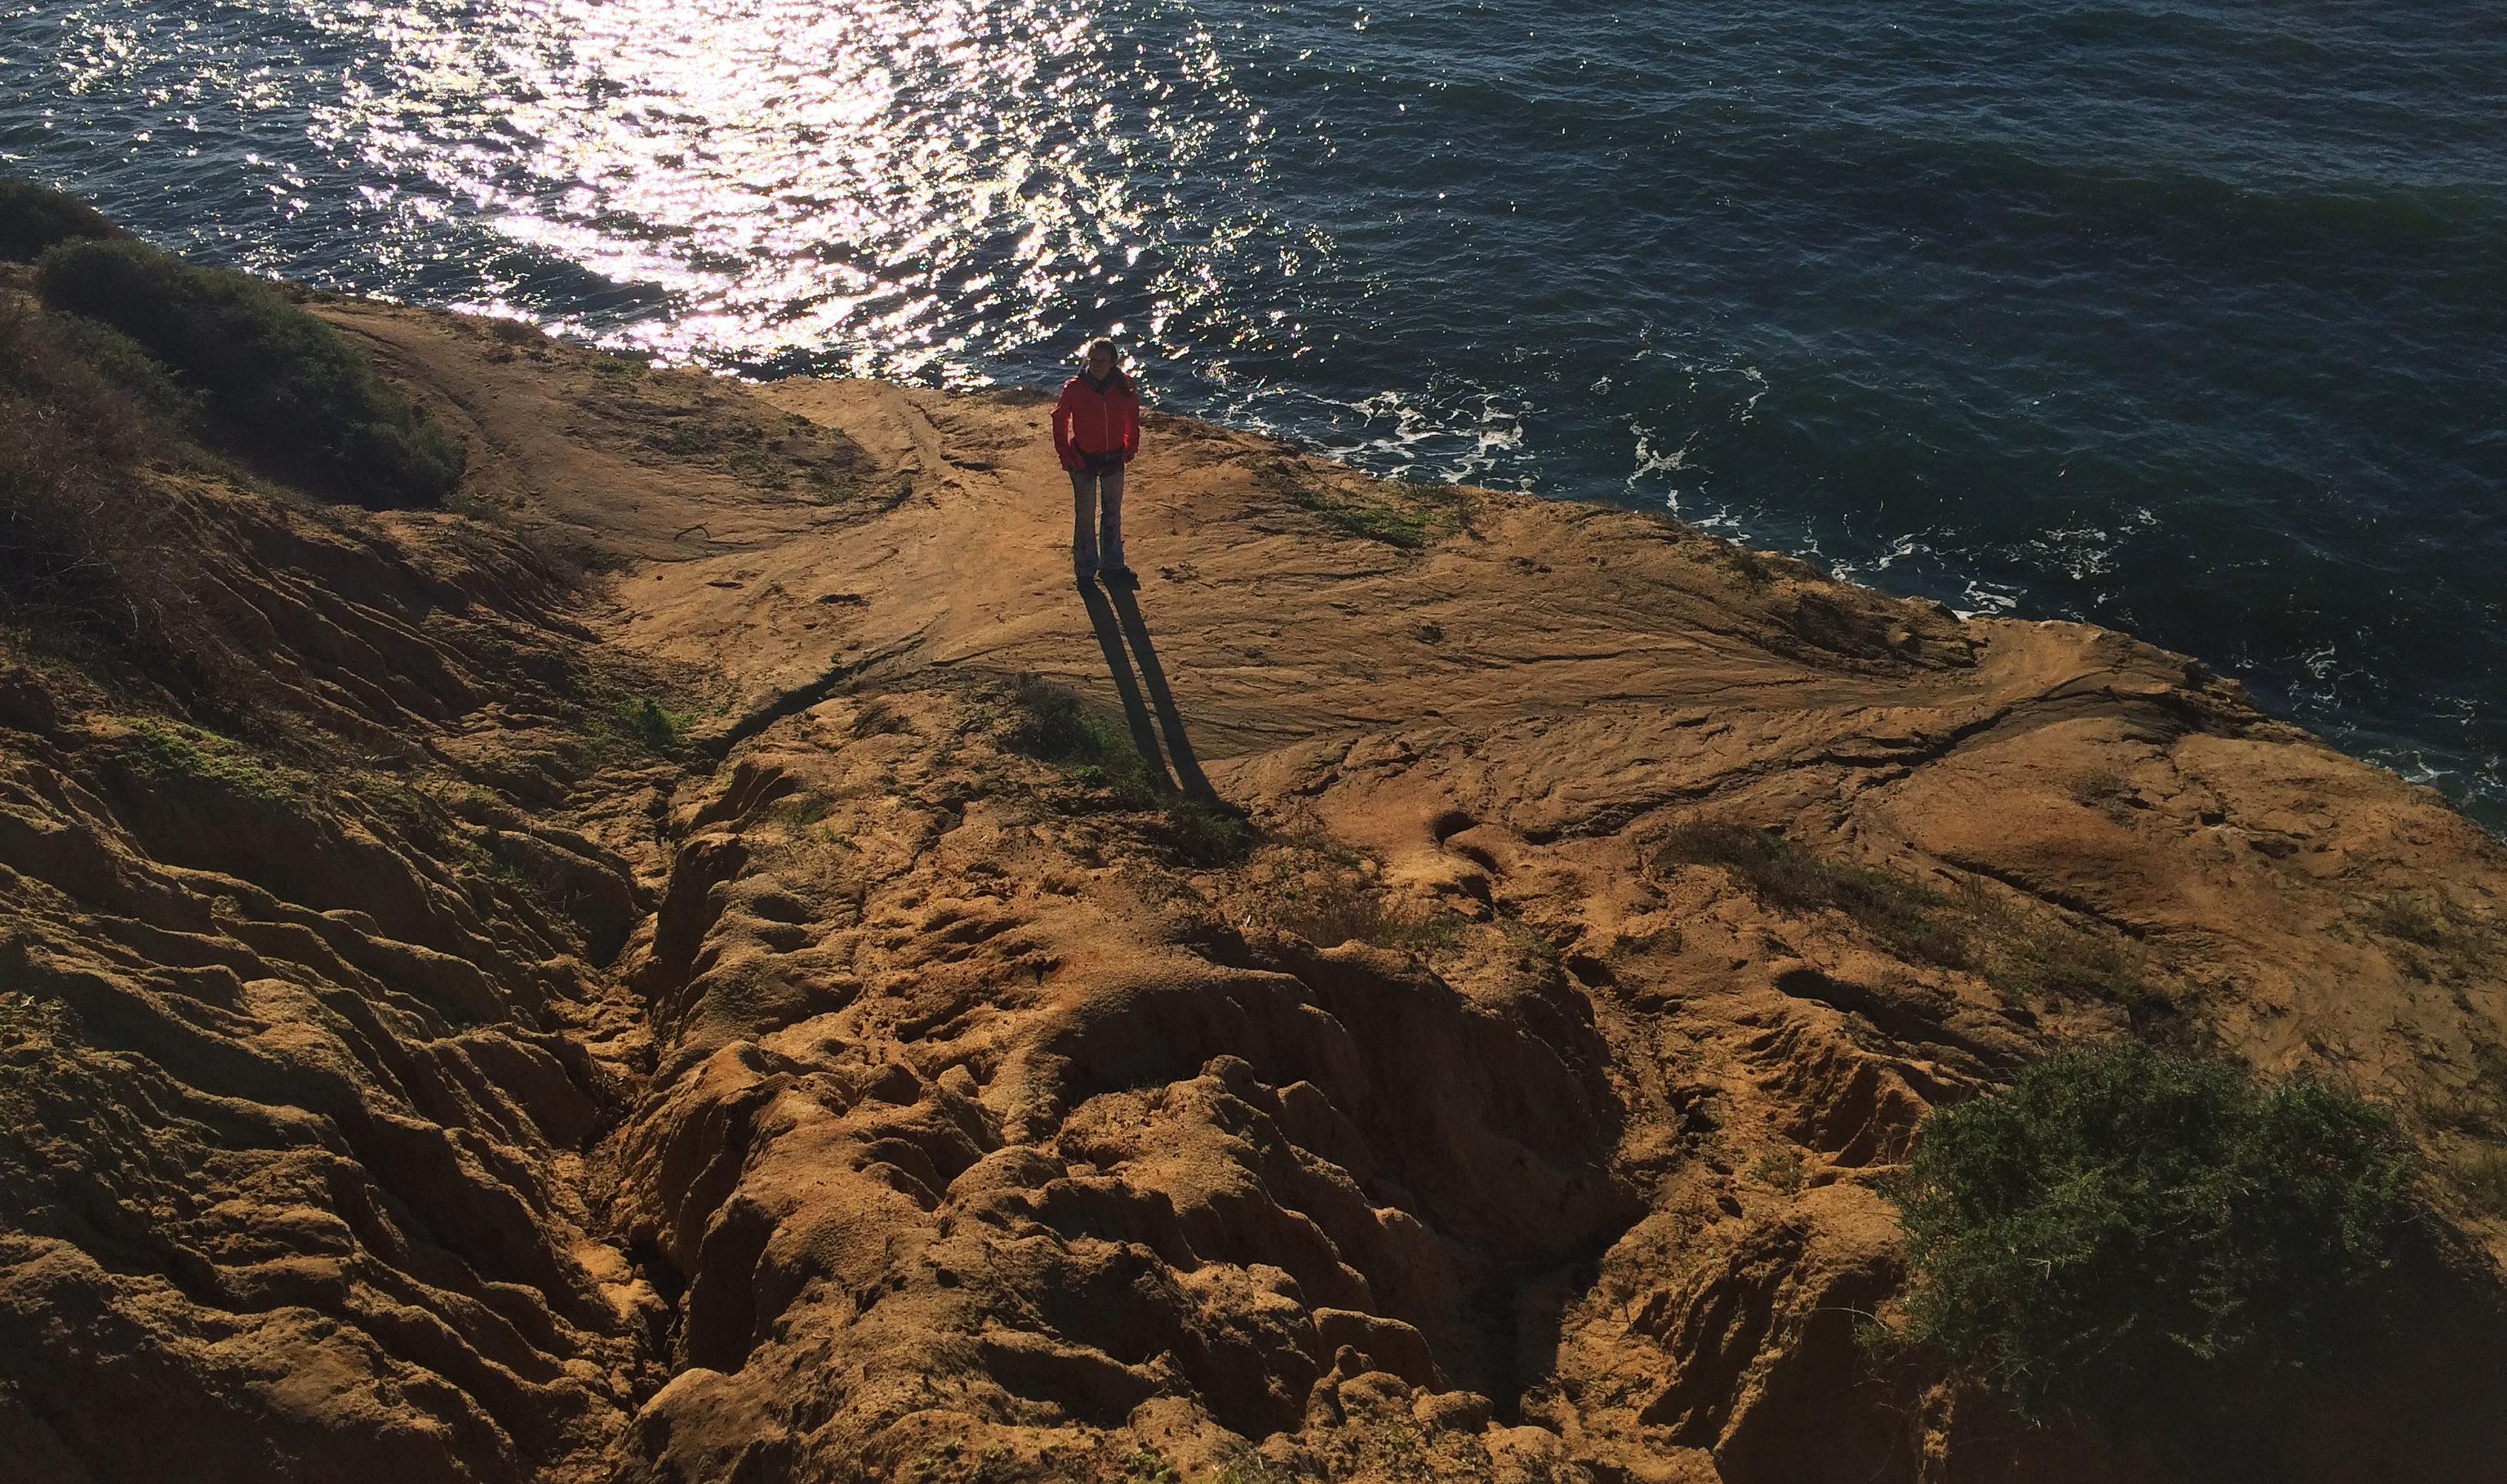 Sunset Cliffs, San Diego, California, USA